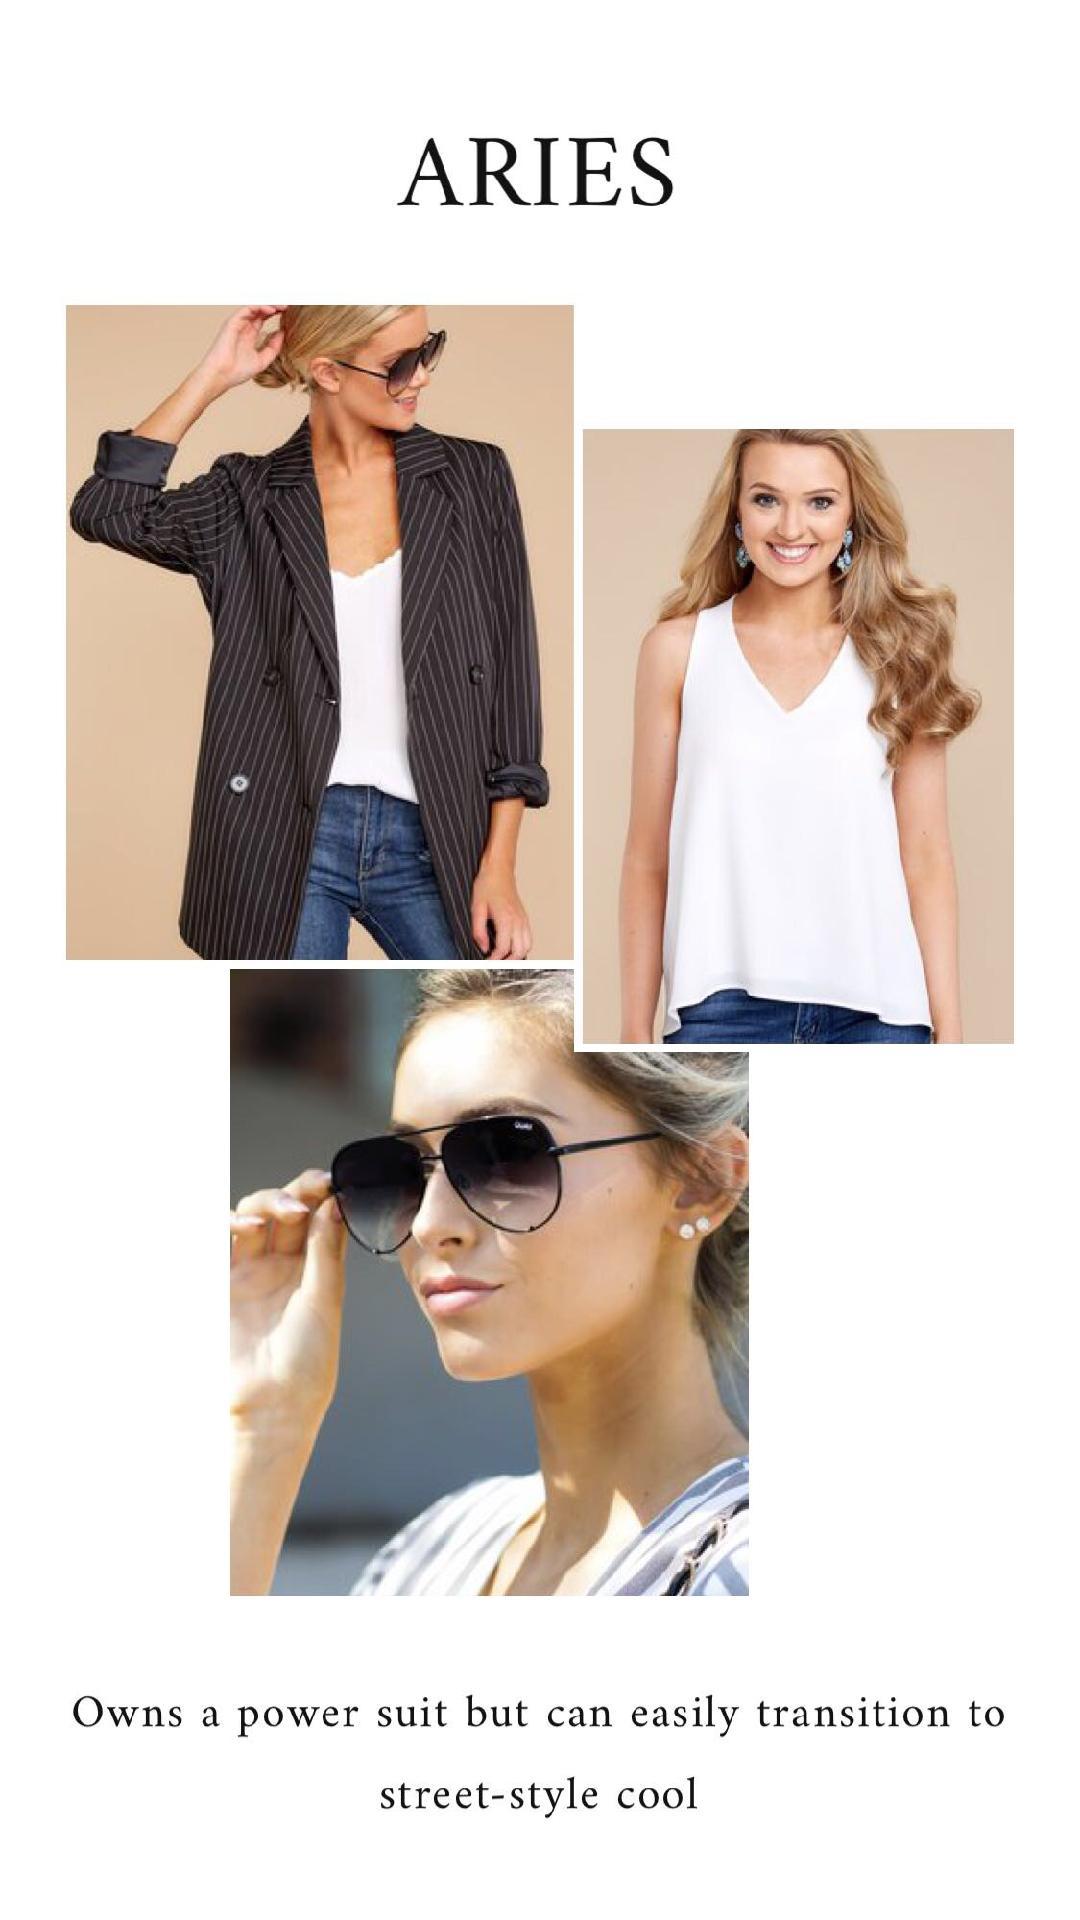 GET THE LOOK - Black Striped BlazerIn No Rush White TopHigh Key Black Fade Sunglasses